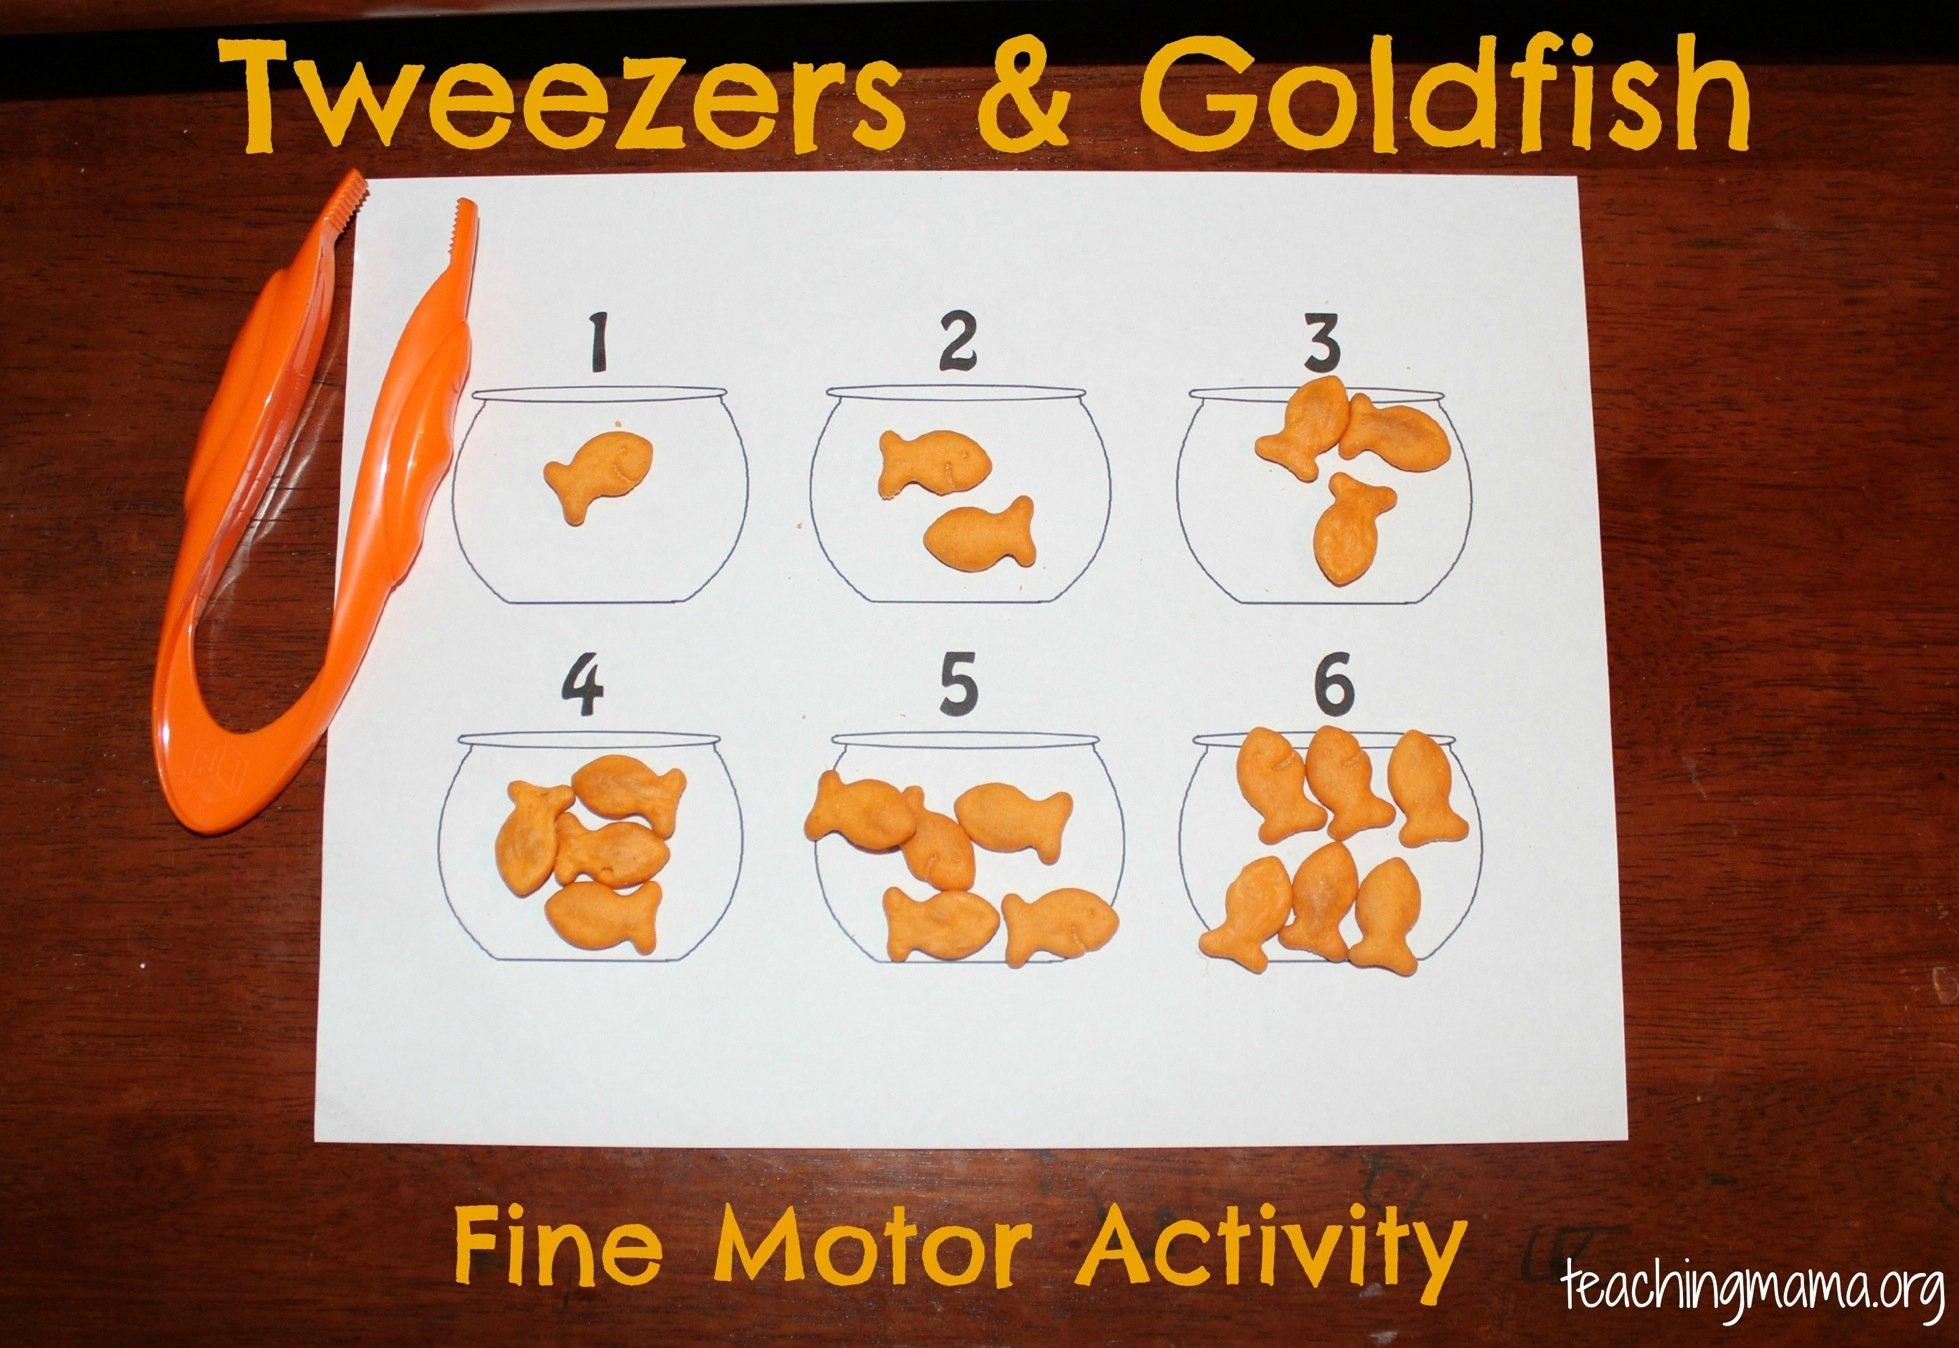 Fine motor skills tweezers goldfish teaching mama for List of fine motor skills for preschoolers